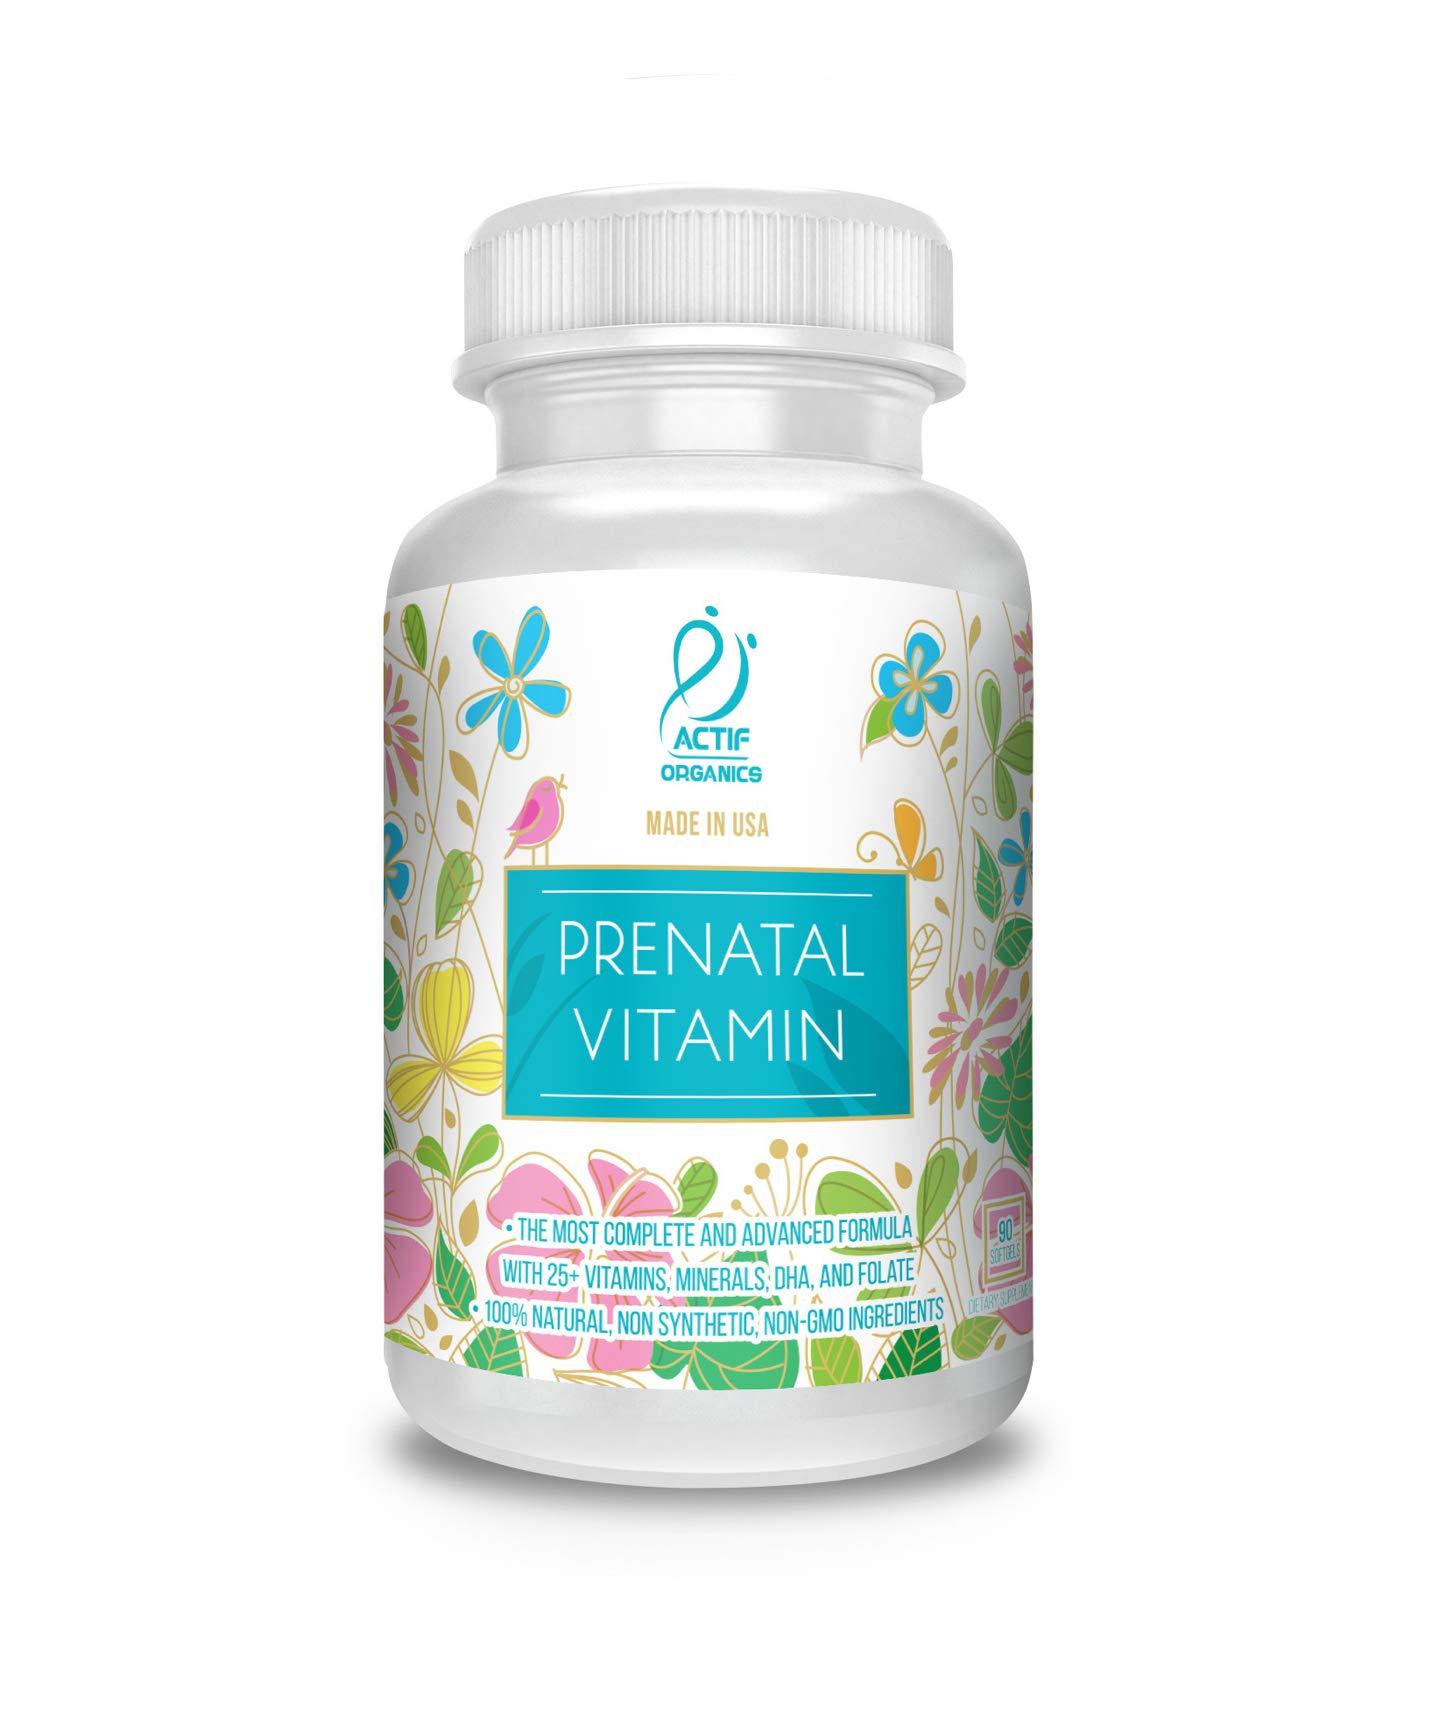 Actif Organic Prenatal Vitamin with 25+ Organic Vitamins, 100% Natural, DHA, EPA, Omega 3, and Organic Herbal Blend - Non-GMO, 90 Count